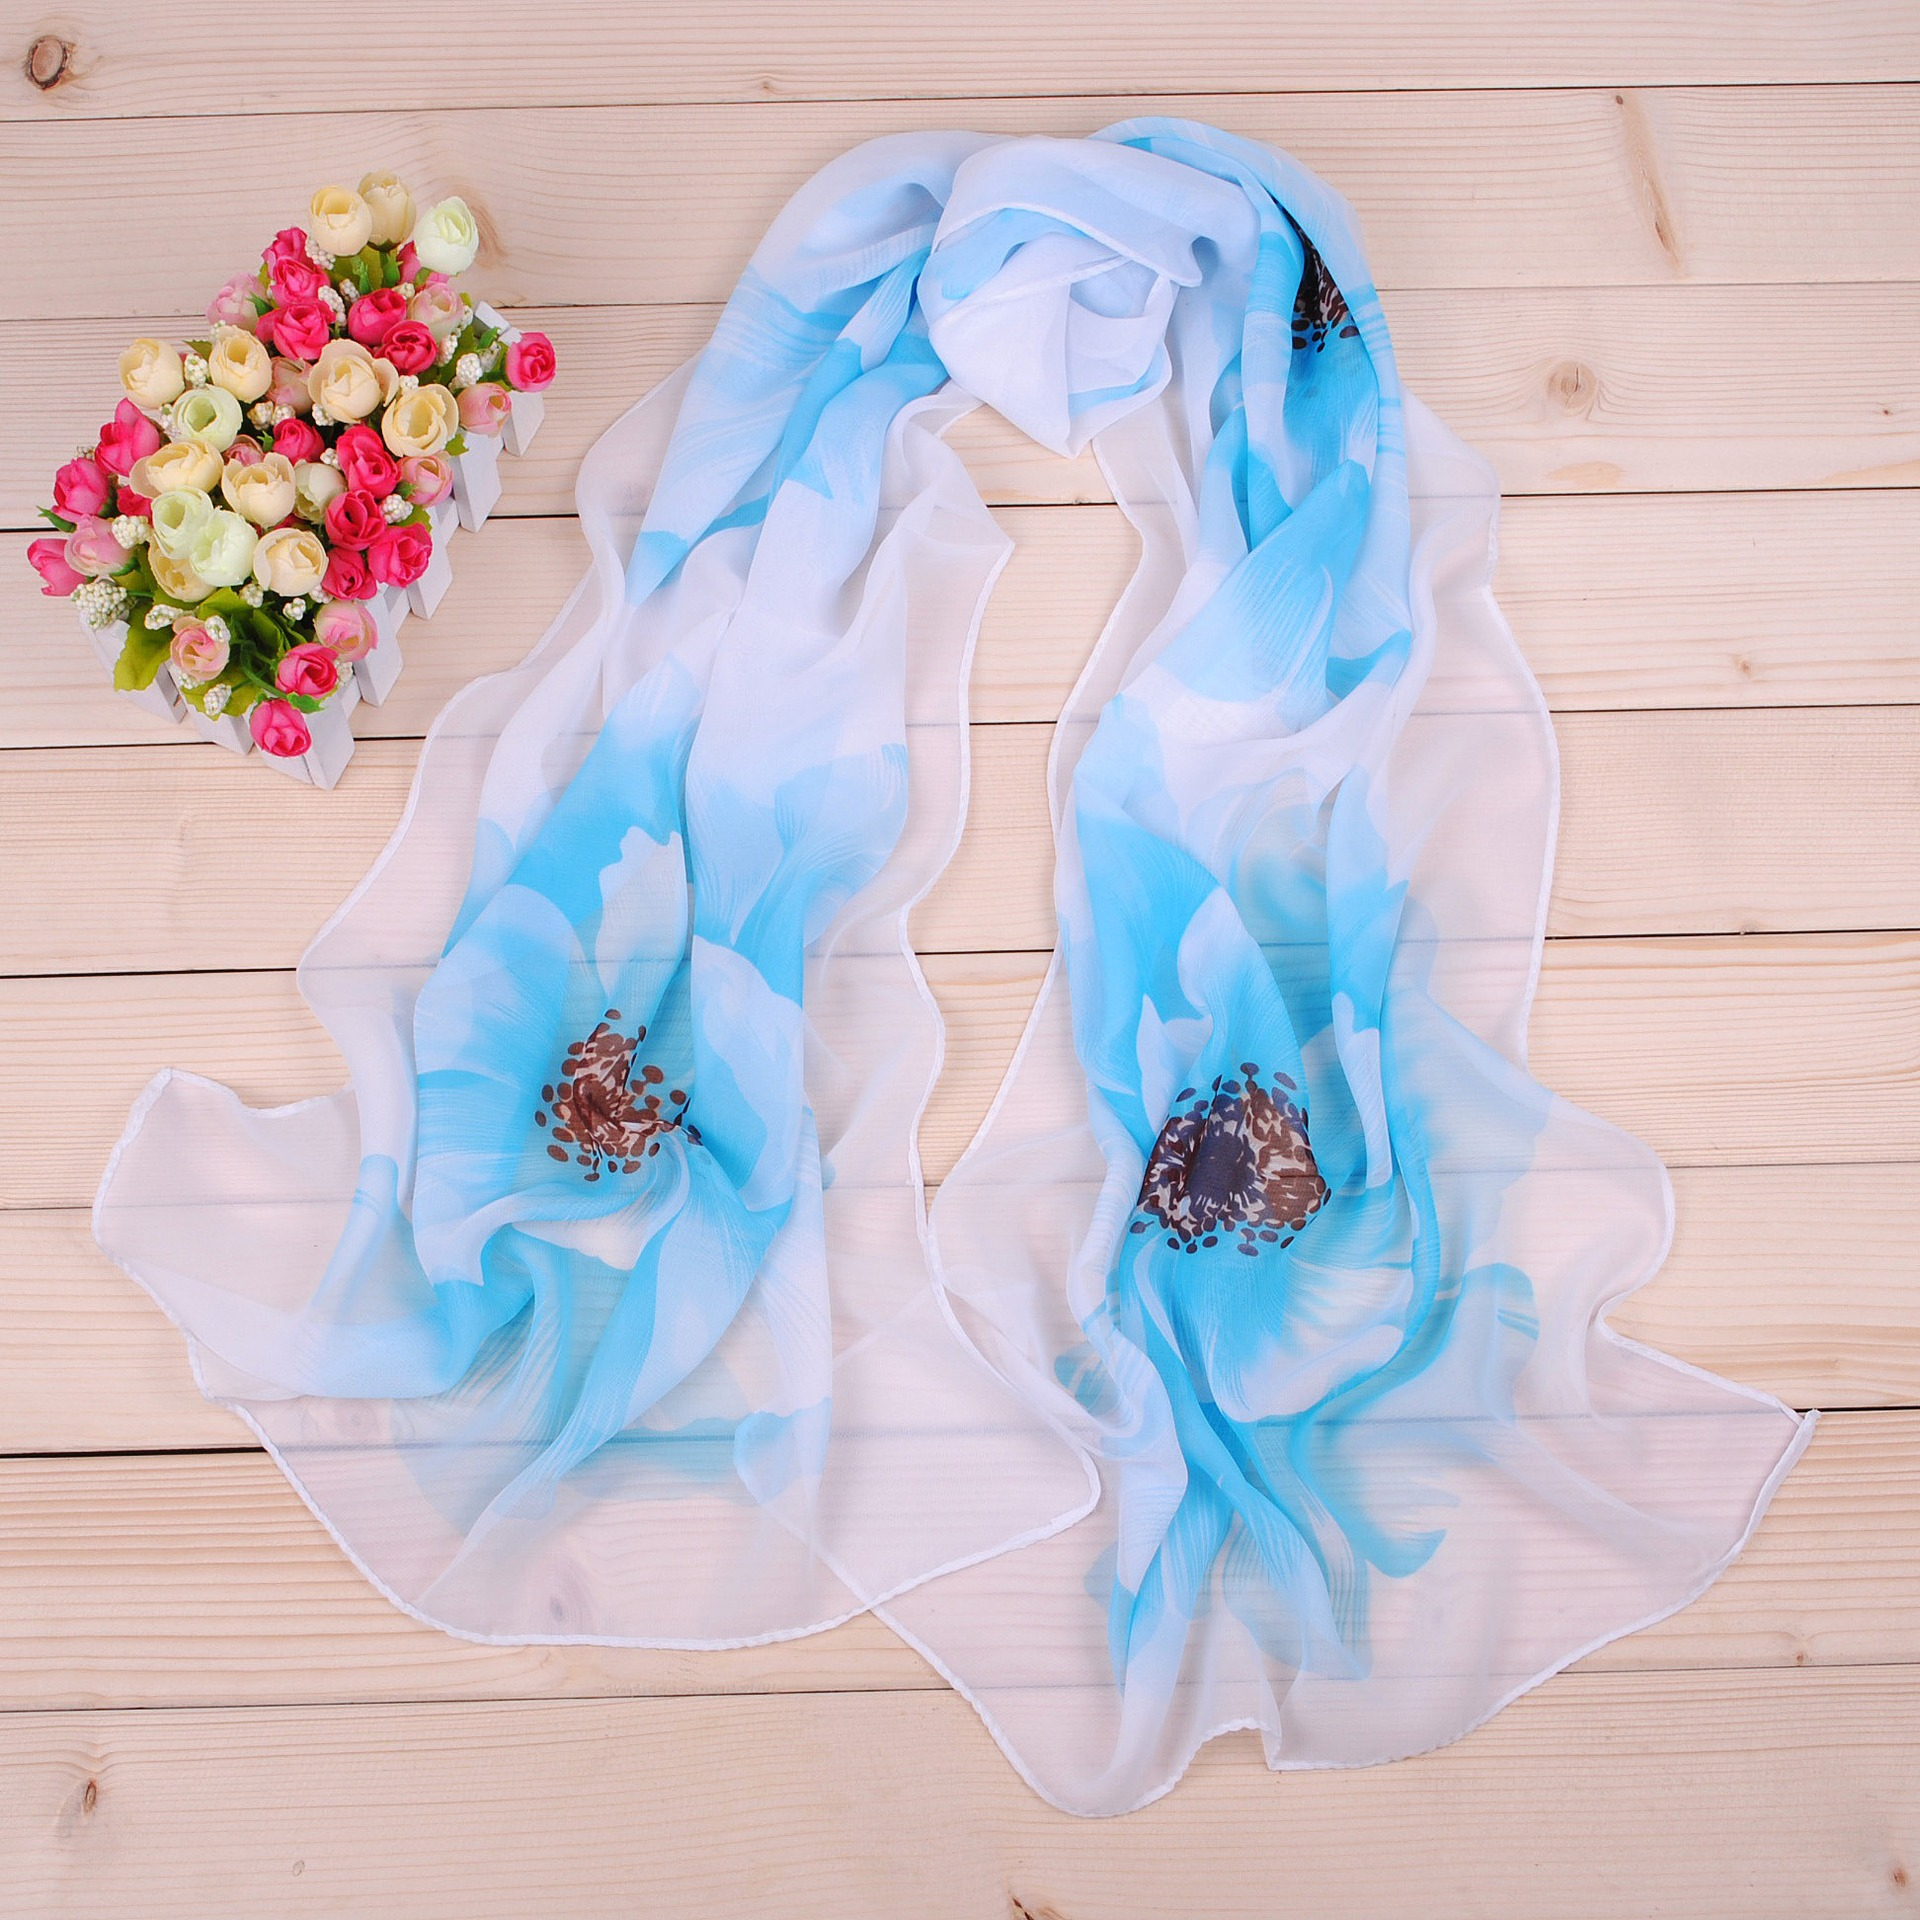 Spring Silk   Scarf   Fashion Accessories Elegant Organza   Scarf     Wrap   Lightweight Long   Scarves   designer   scarf   women luxury 2019